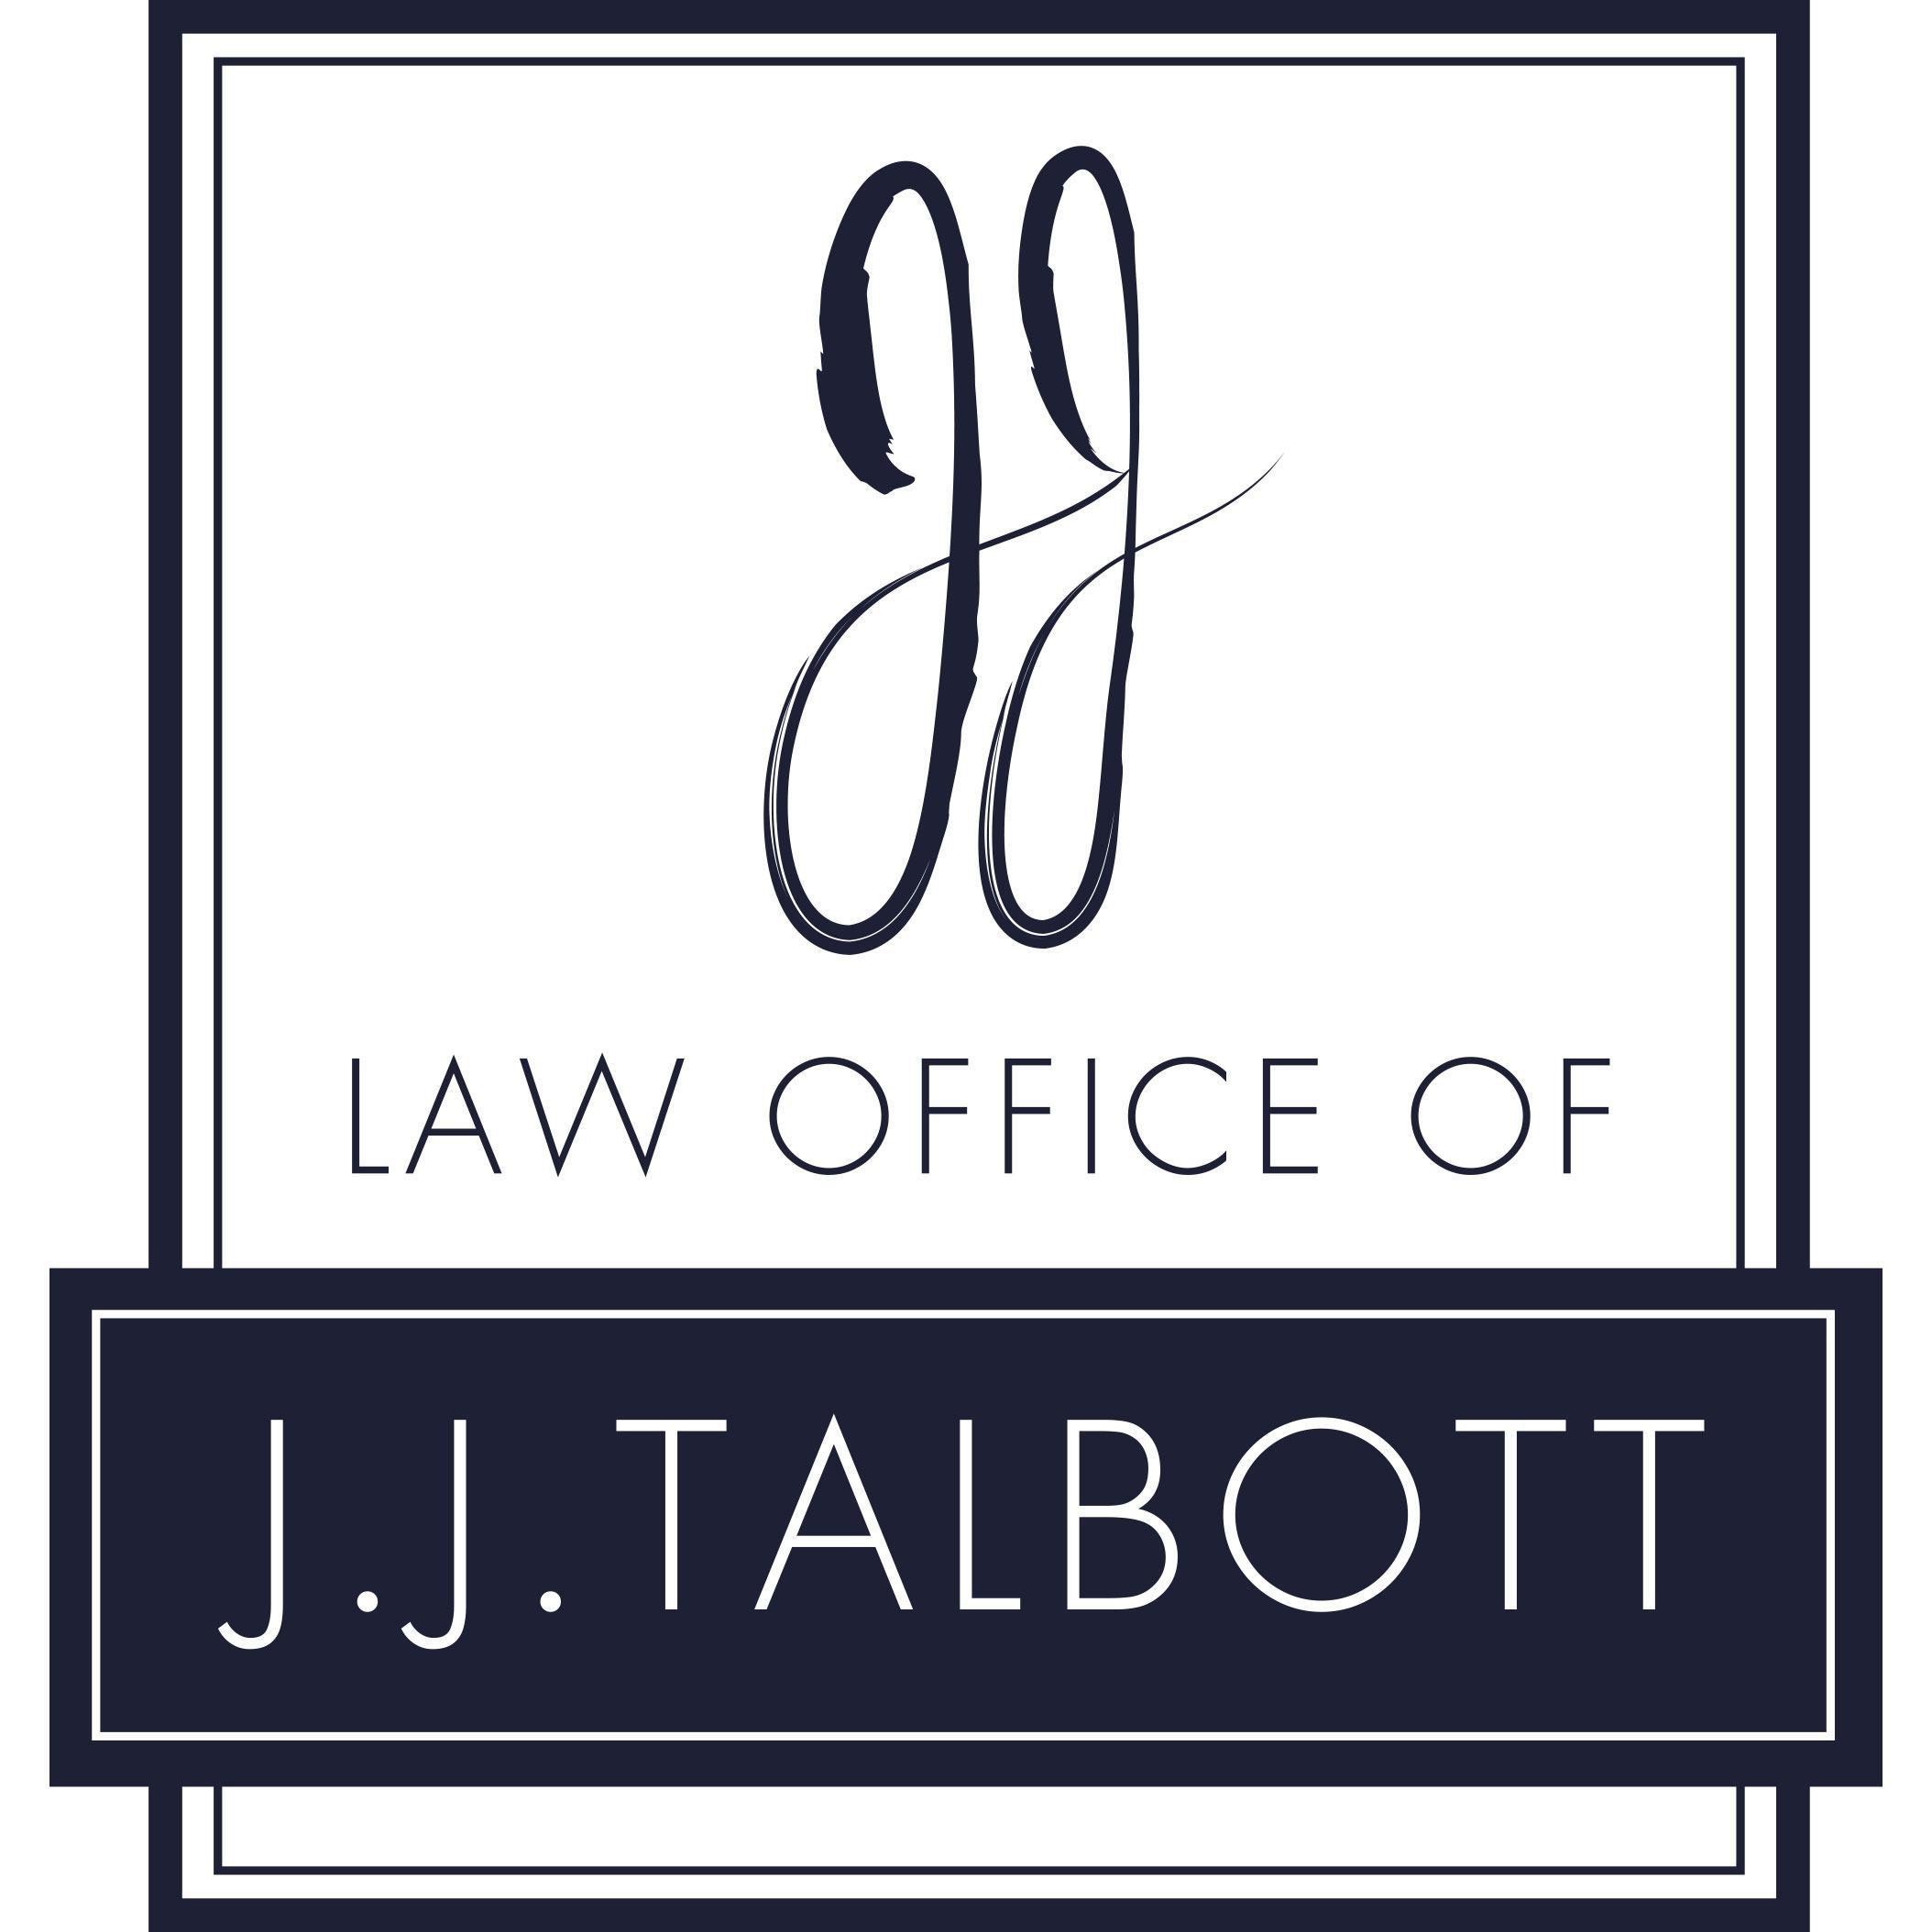 Law Office of J.J. Talbott Logo